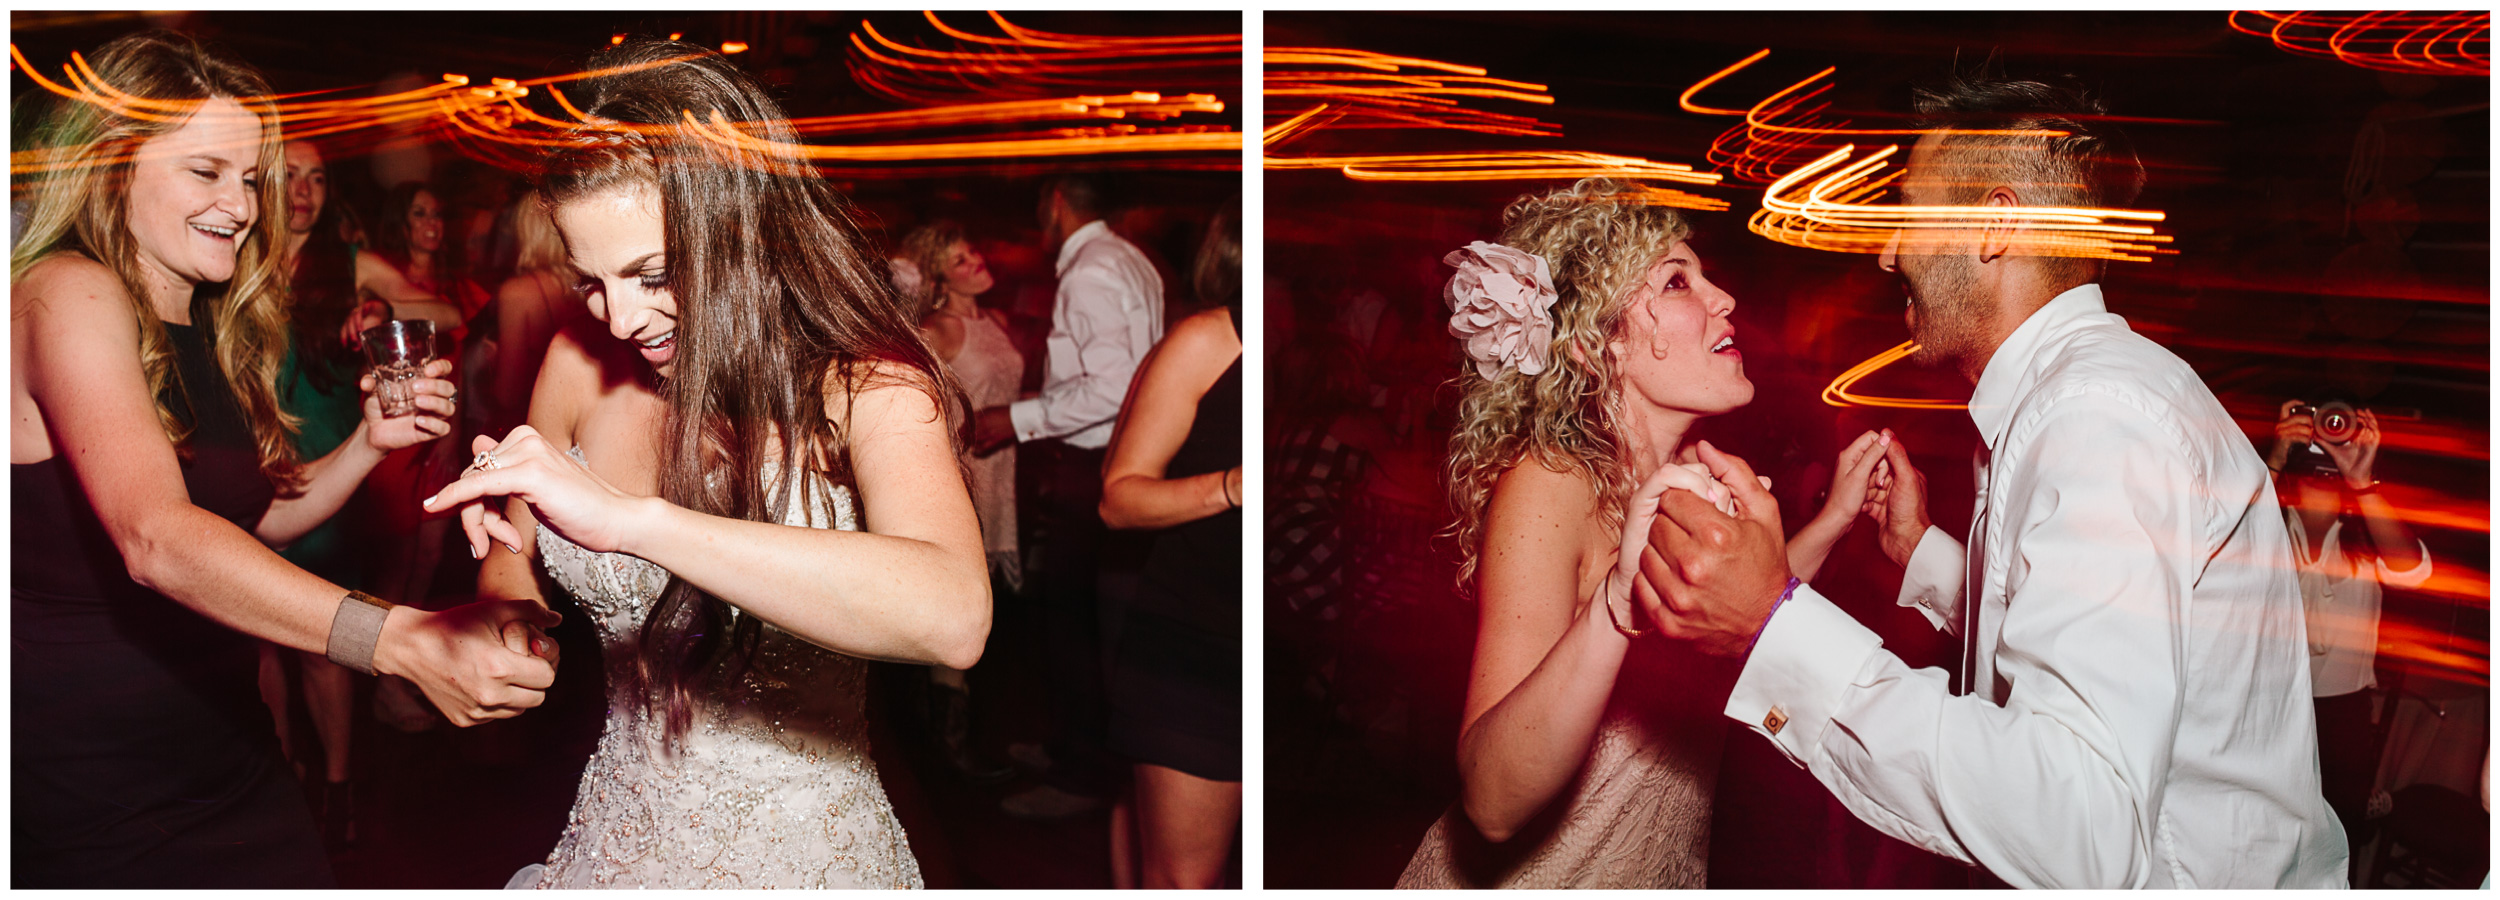 aspen_wedding_97.jpg